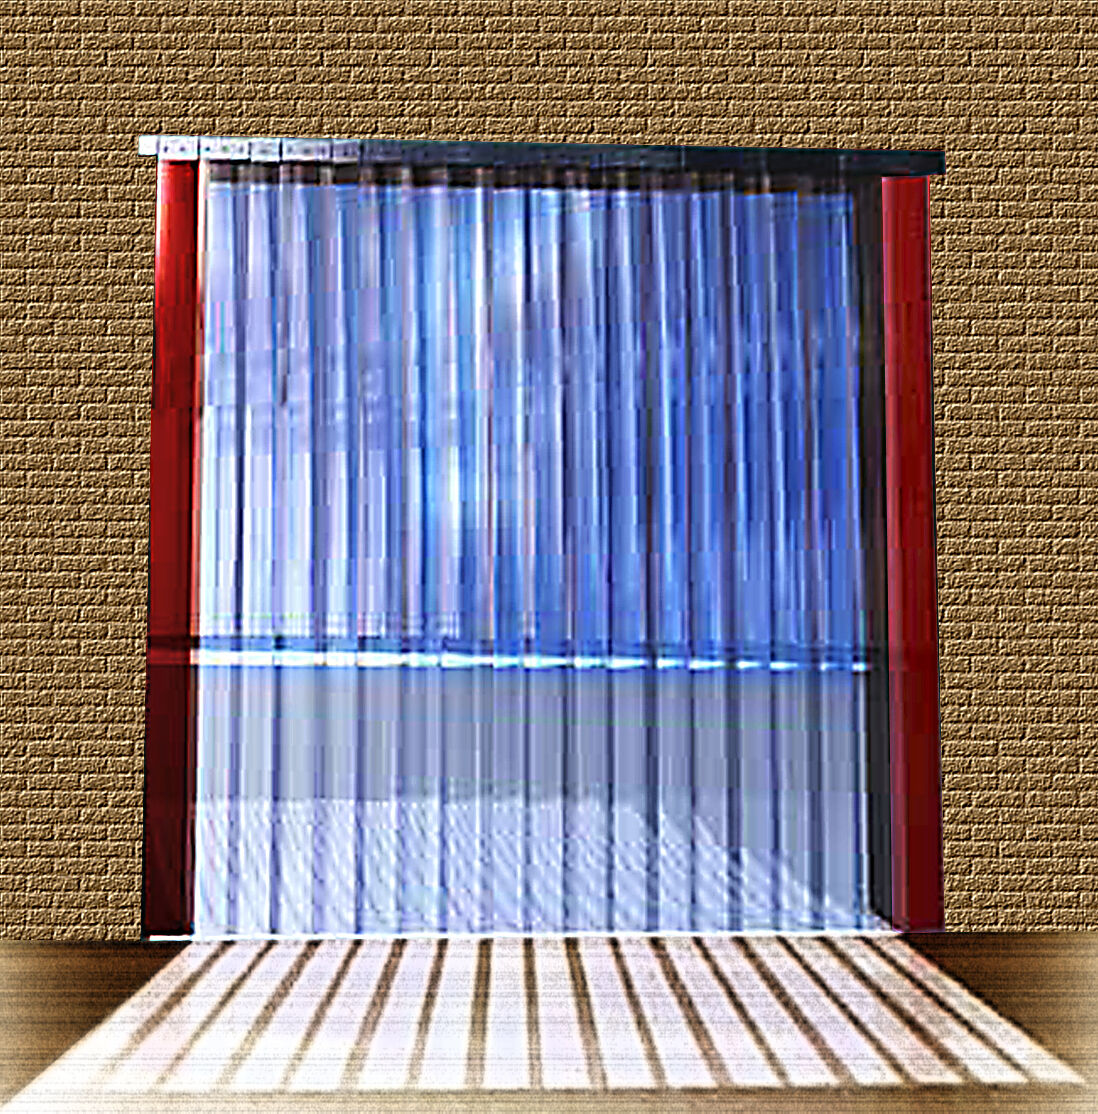 B 0 85m x H2 25m Lamellen PVC Streifen Vorhang 200x2mm